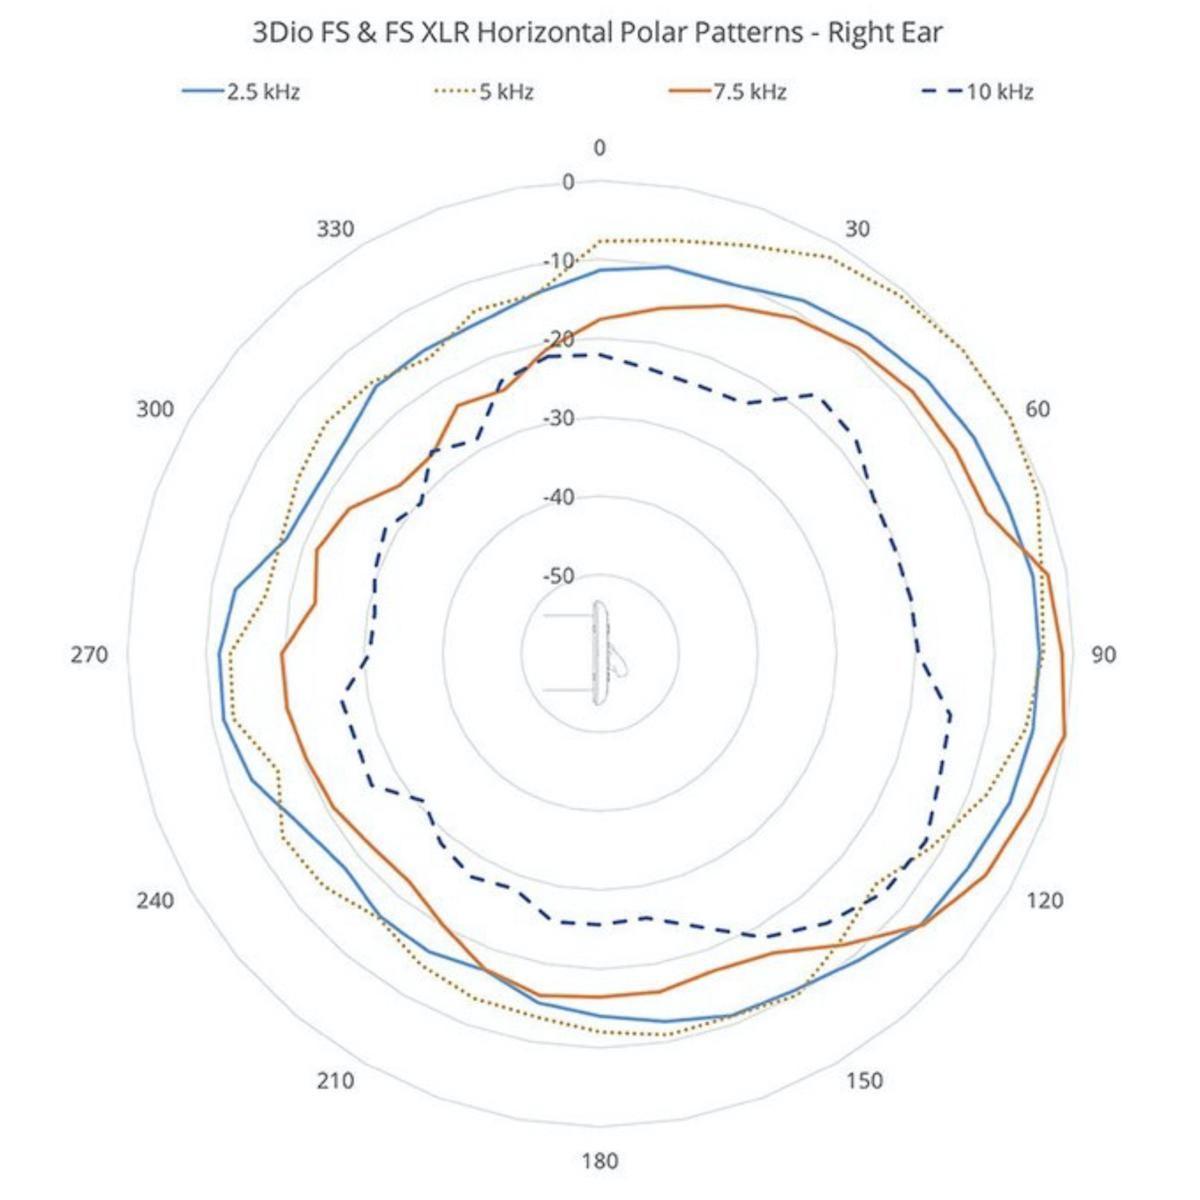 3DIO FS & FSXLR Microphone Horizontal Polar pattern right ear